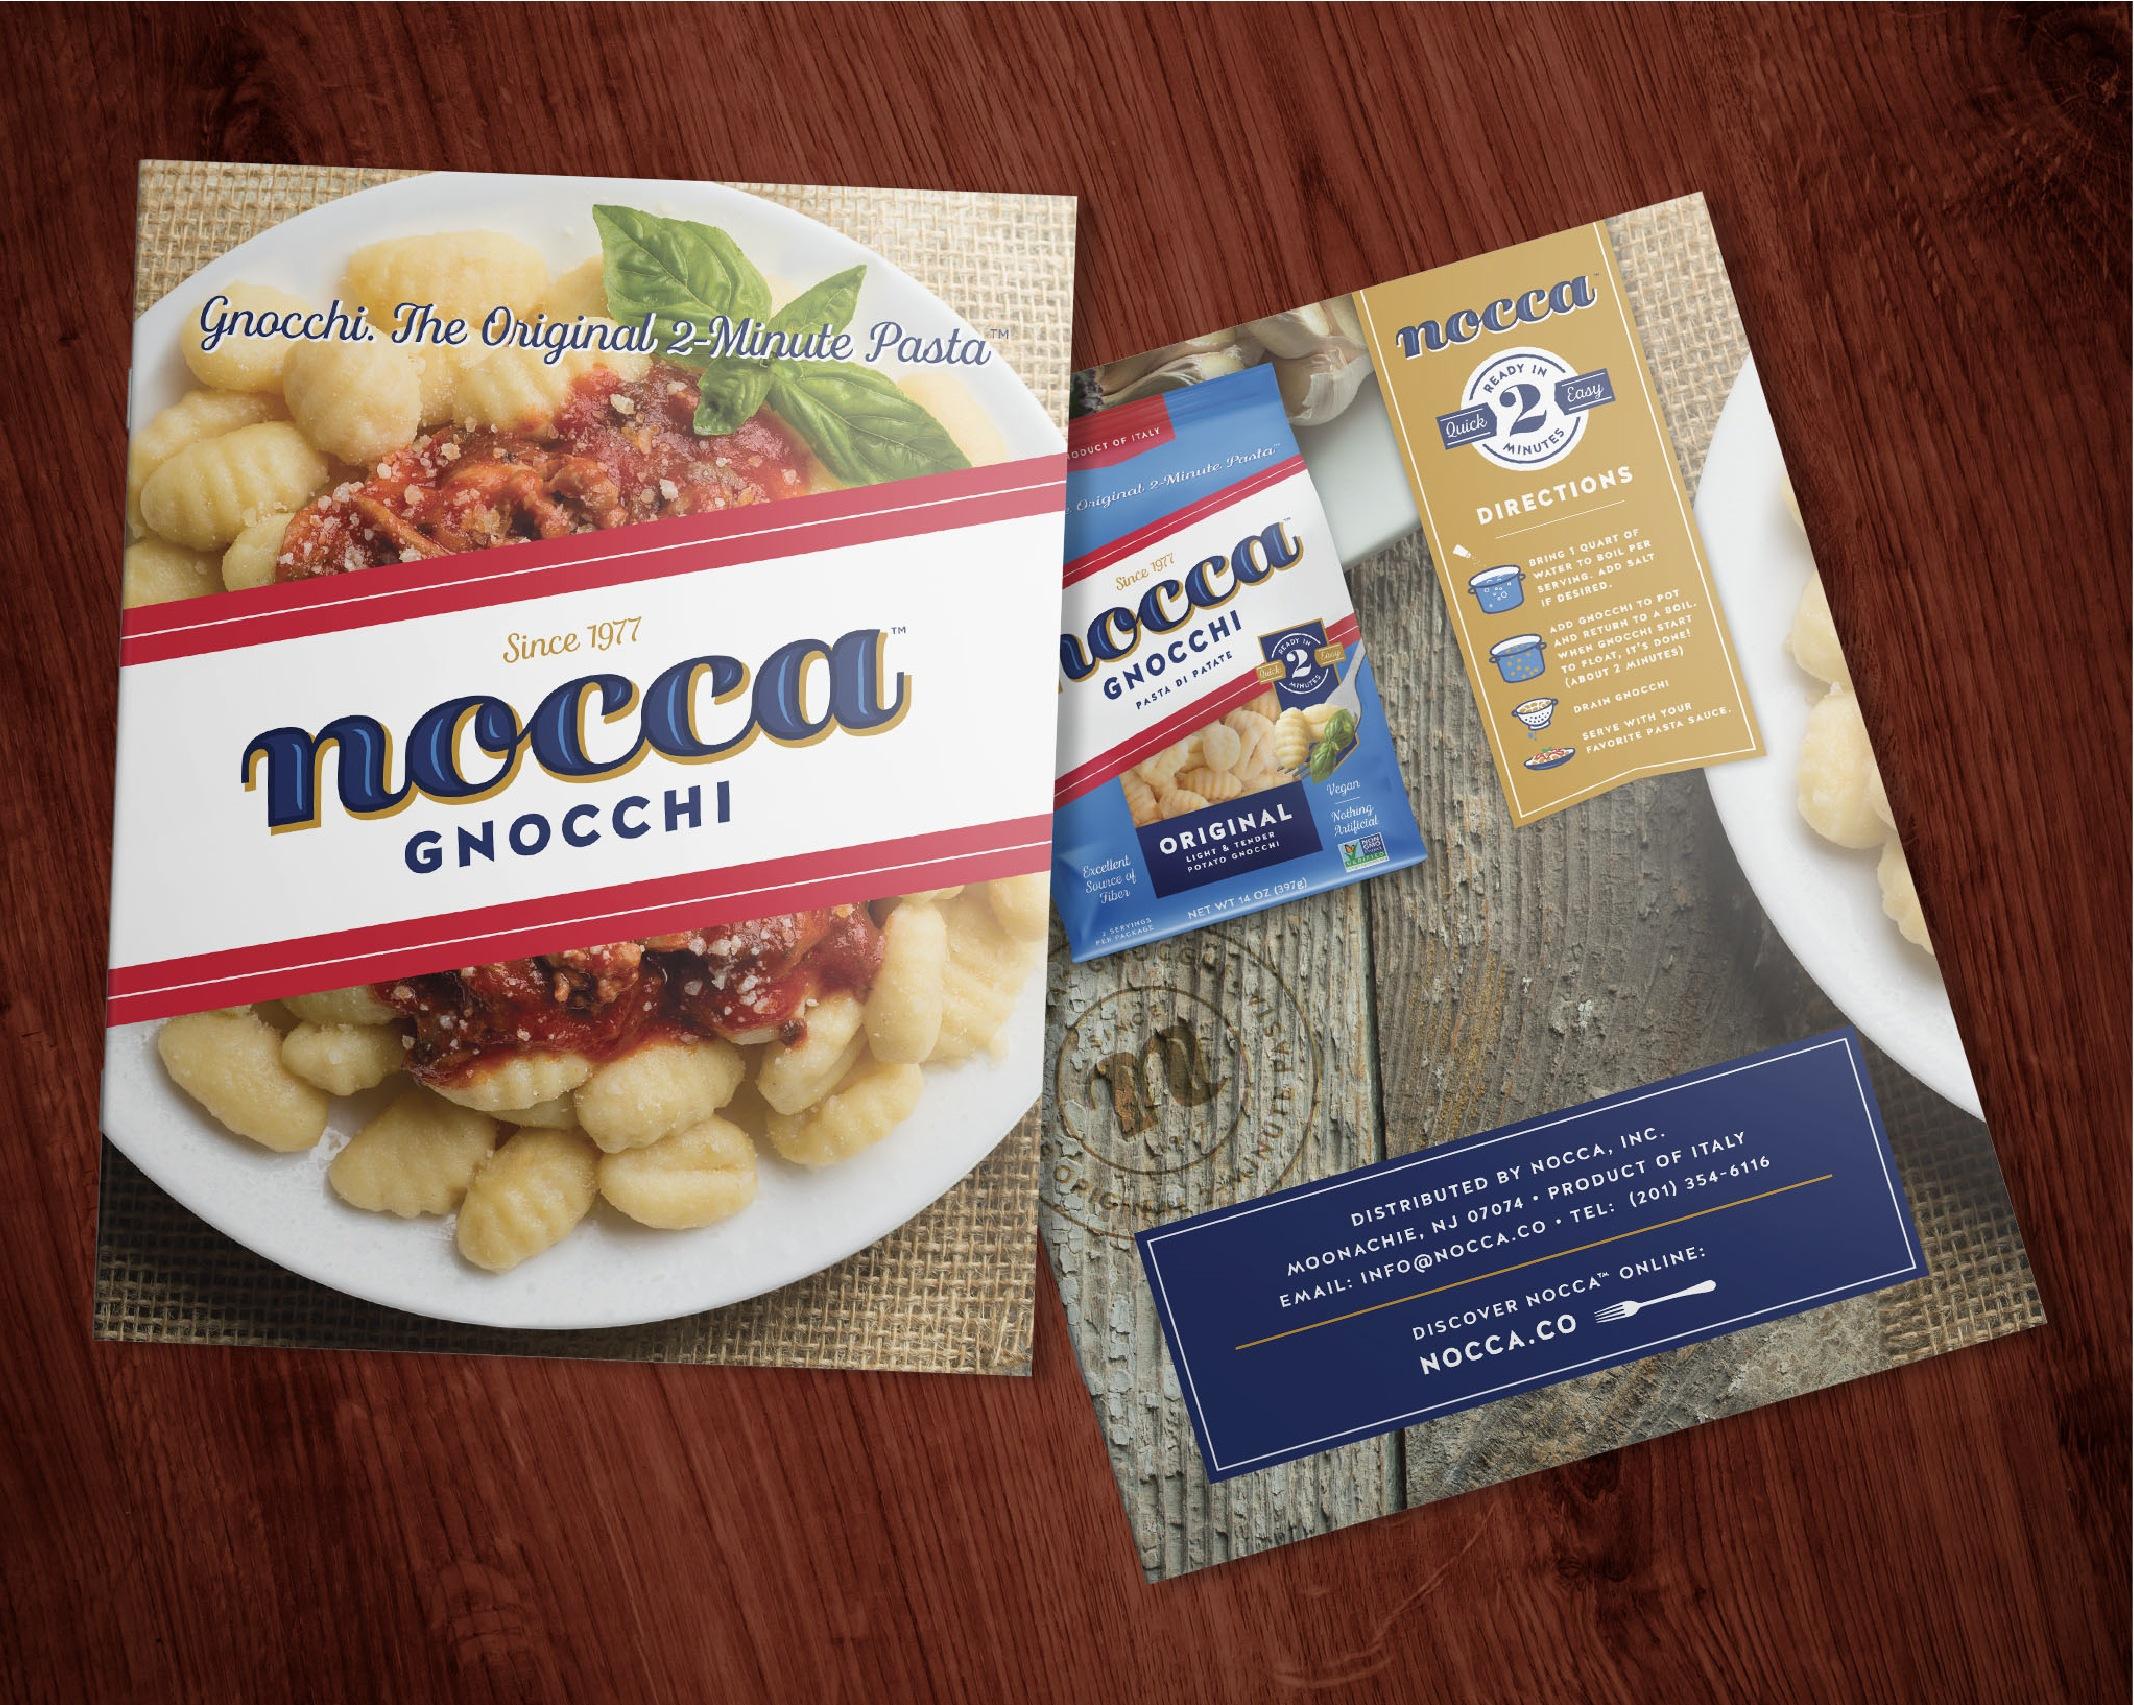 Nocca Pasta Brand Marketing